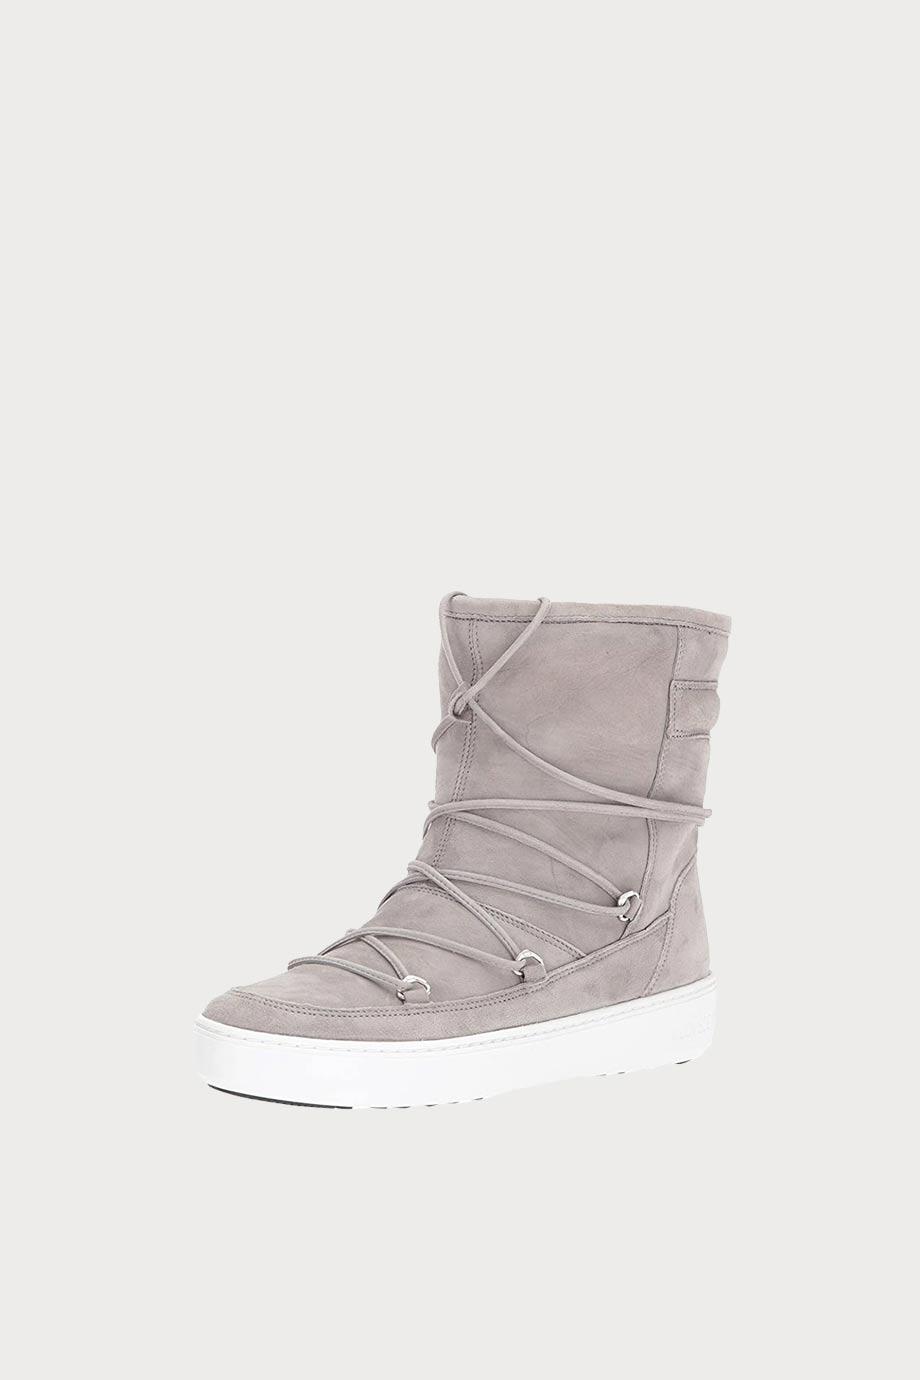 spiridoula metheniti shoes xalkida p 24101700 005 grey low laces MoonBoot 4